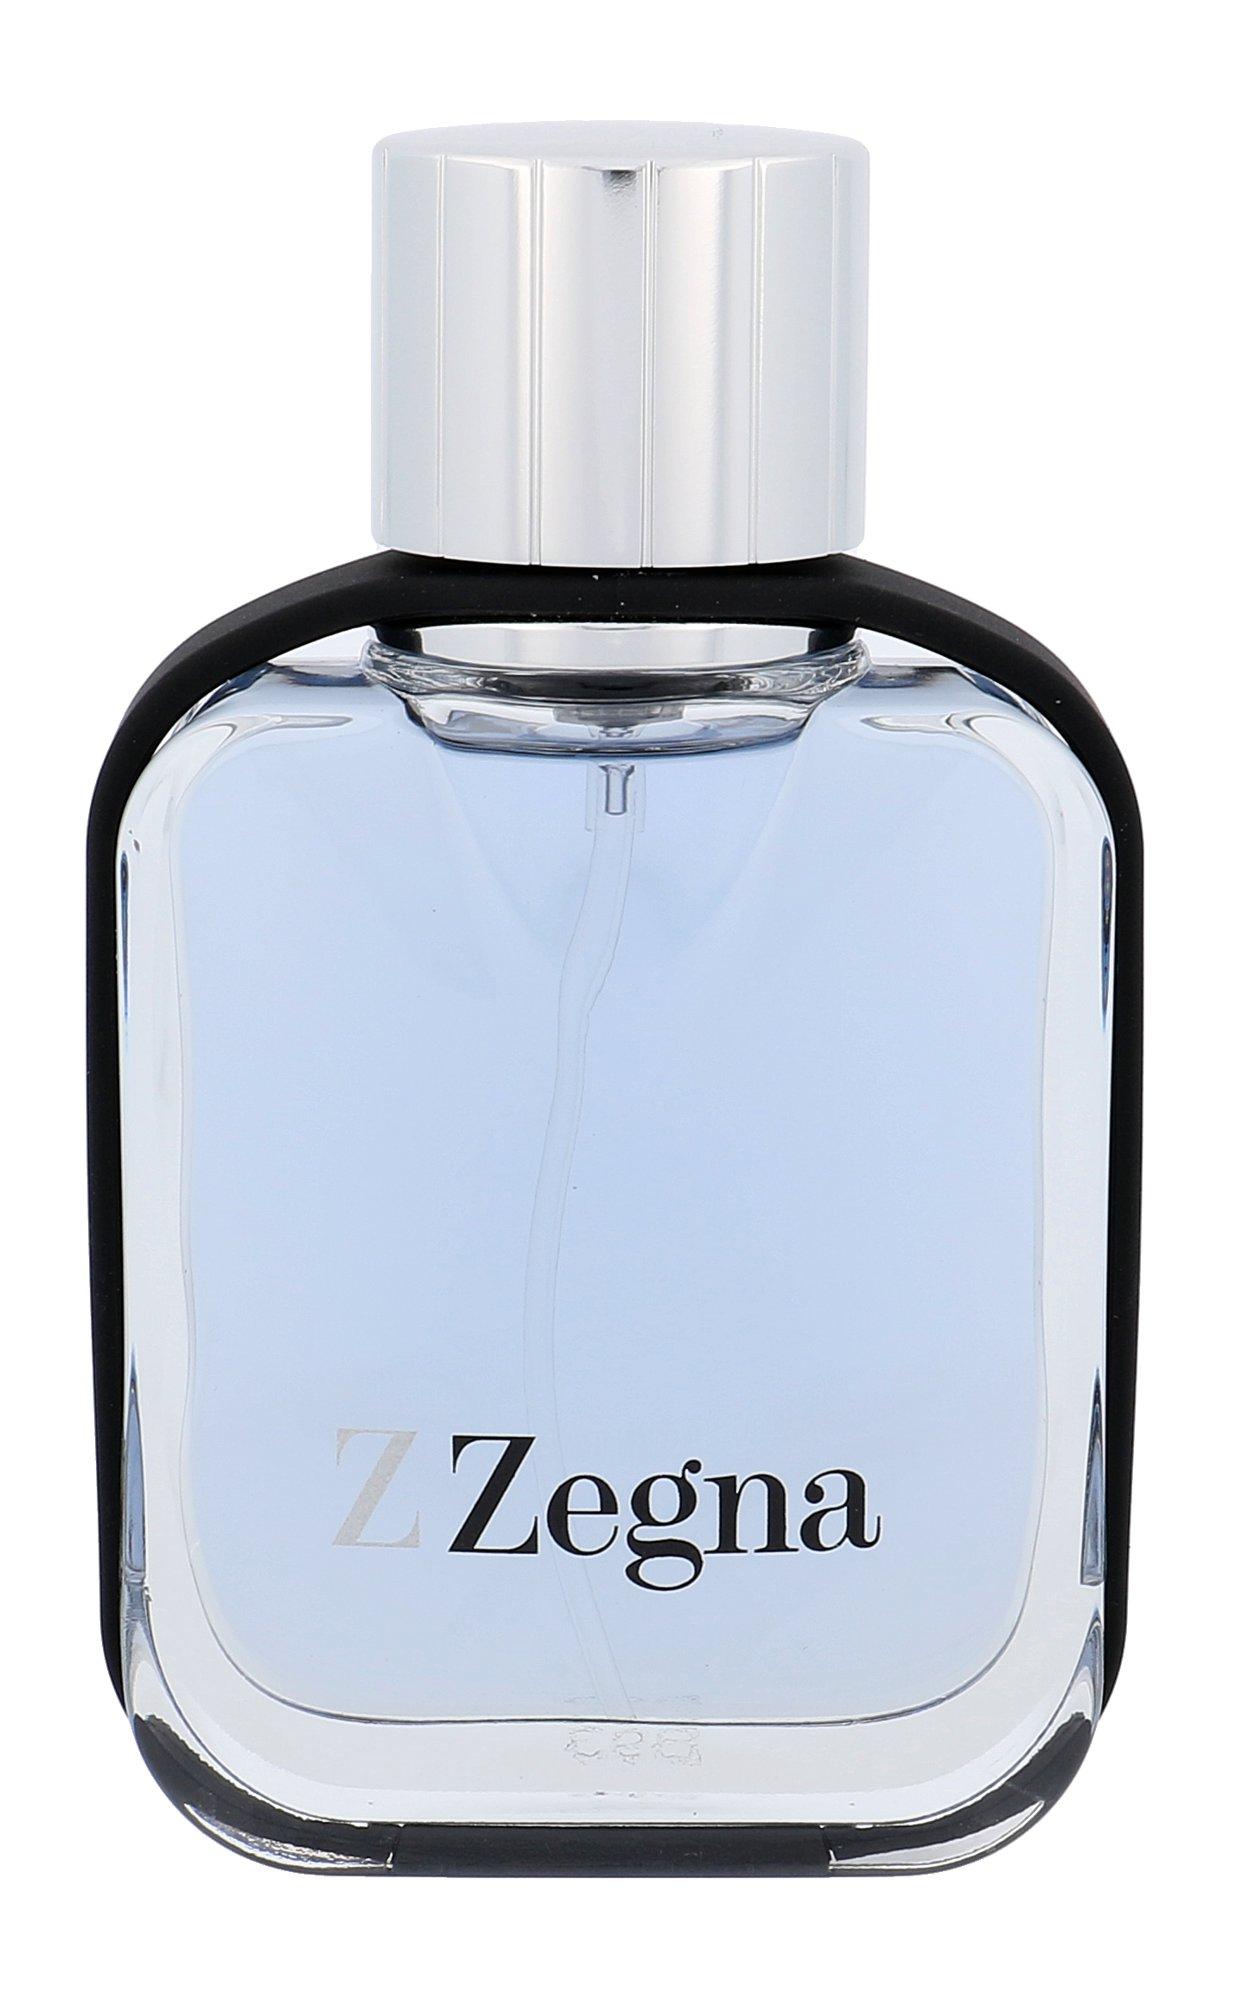 Ermenegildo Zegna Z Zegna, Toaletní voda 50ml